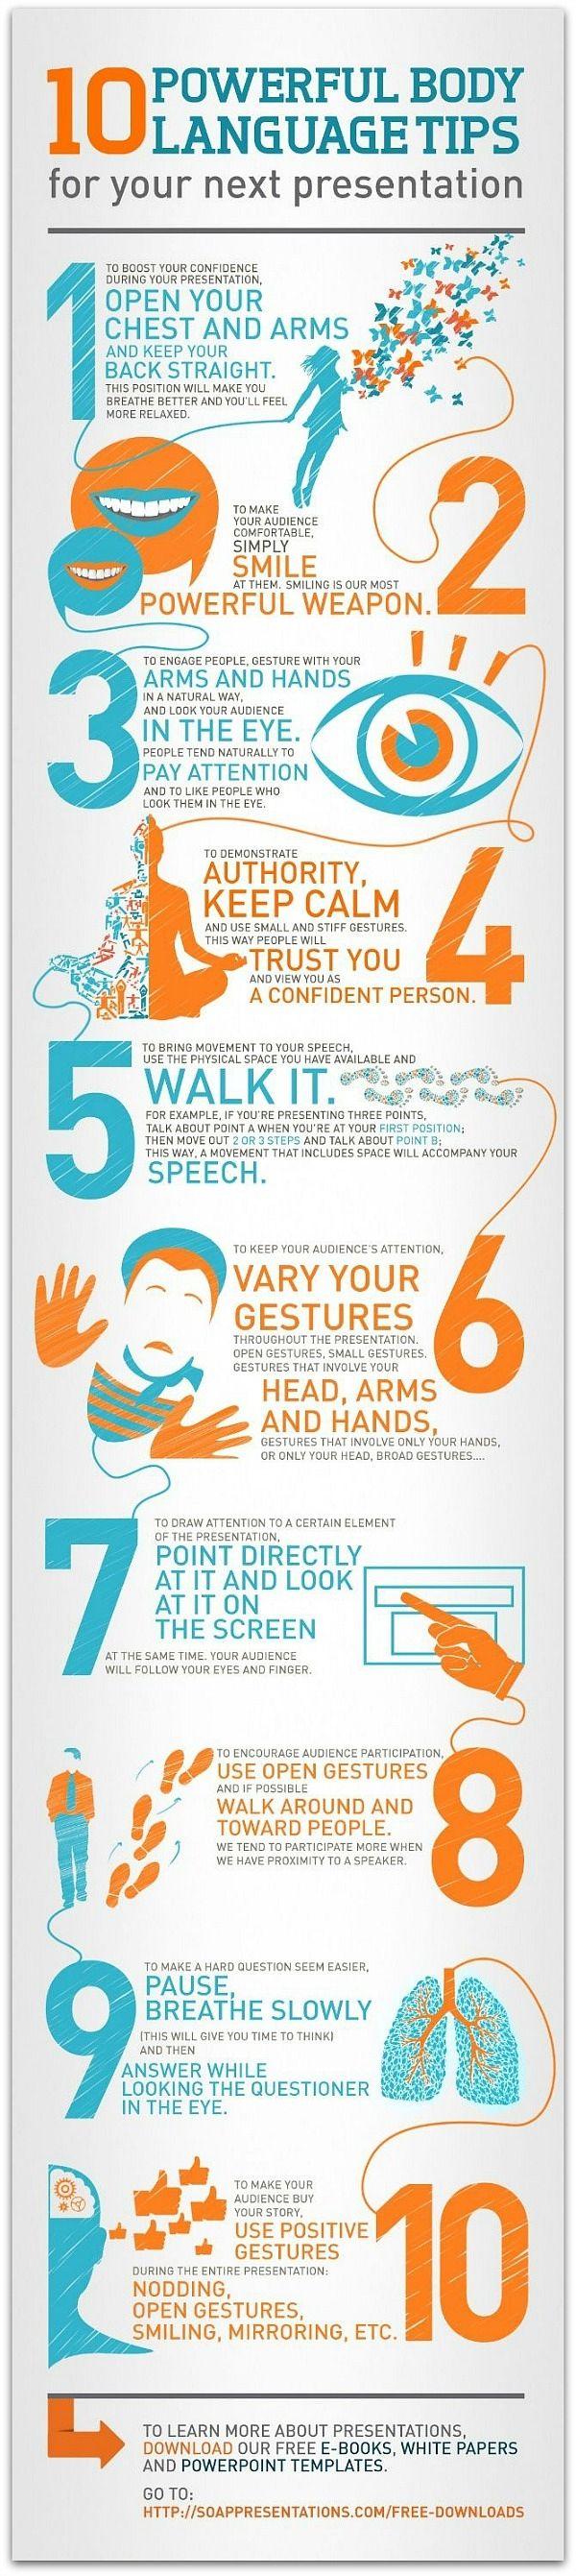 10 Body Language Tips Every Speaker Must Know Public Speaking Presentation Skills Body Language